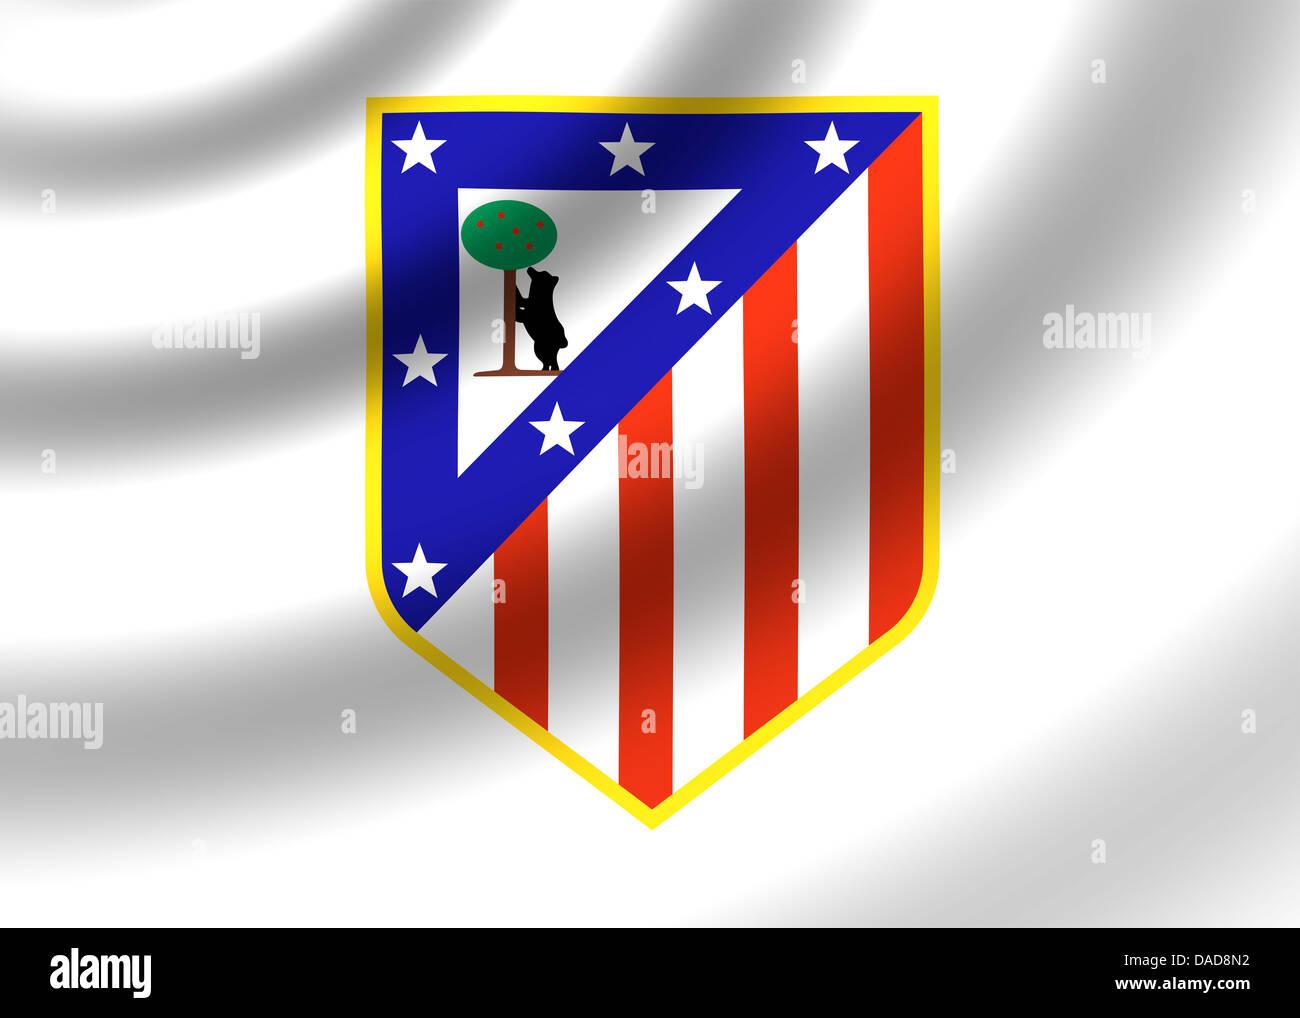 Atletico Madrid Logo Symbol Fahne Emblem Stockfoto Bild 58069902